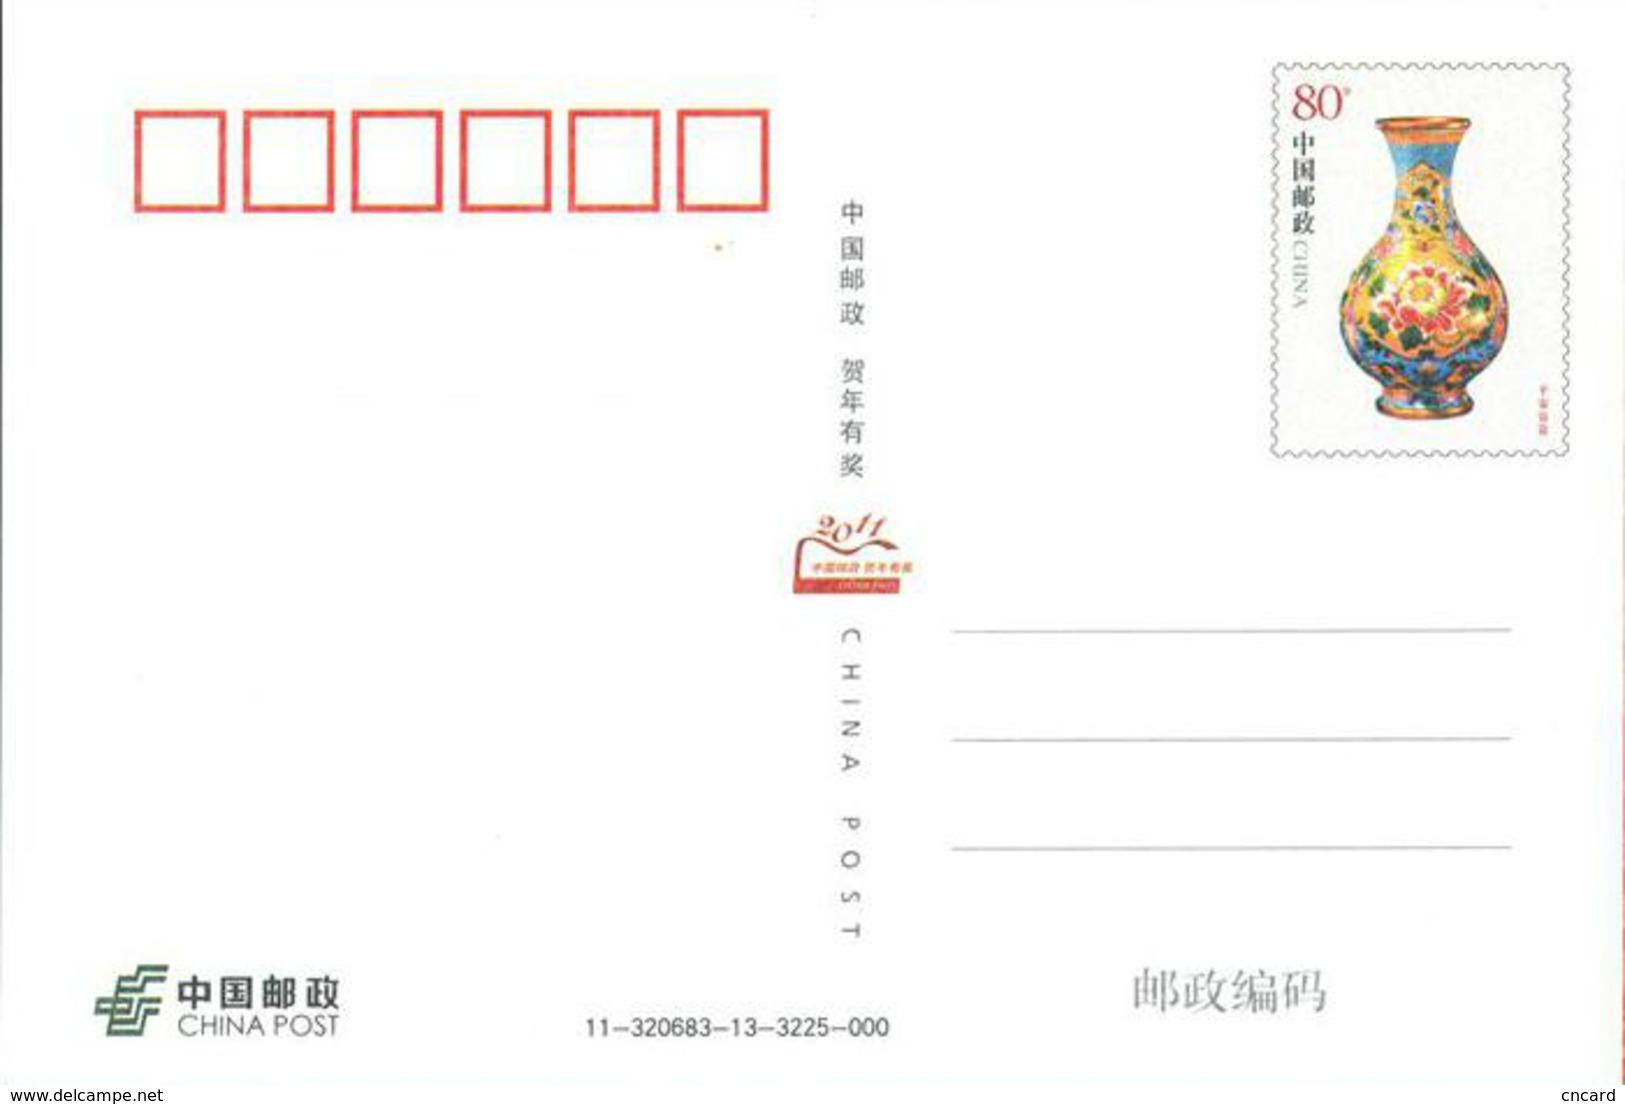 T80-105 ]  Flight Attendants Air Attendants Stewardesses Hostesses Cabin Crew , China Pre-paid Card, Postal Stationery - Jobs